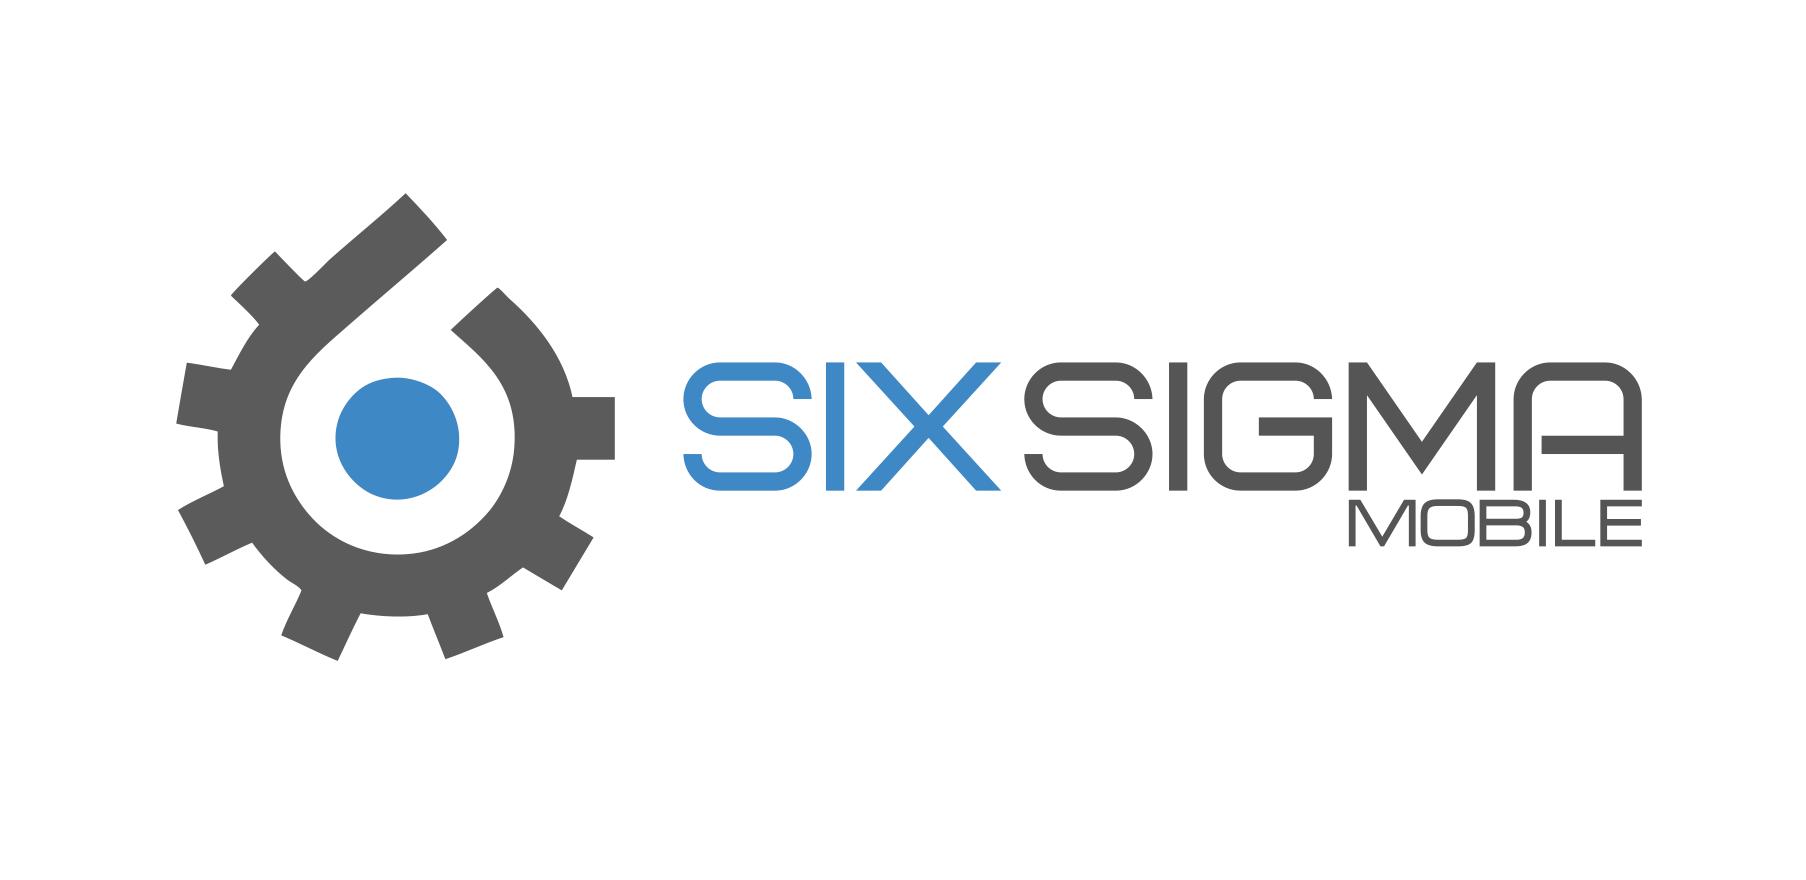 Sixsigma Logo Design